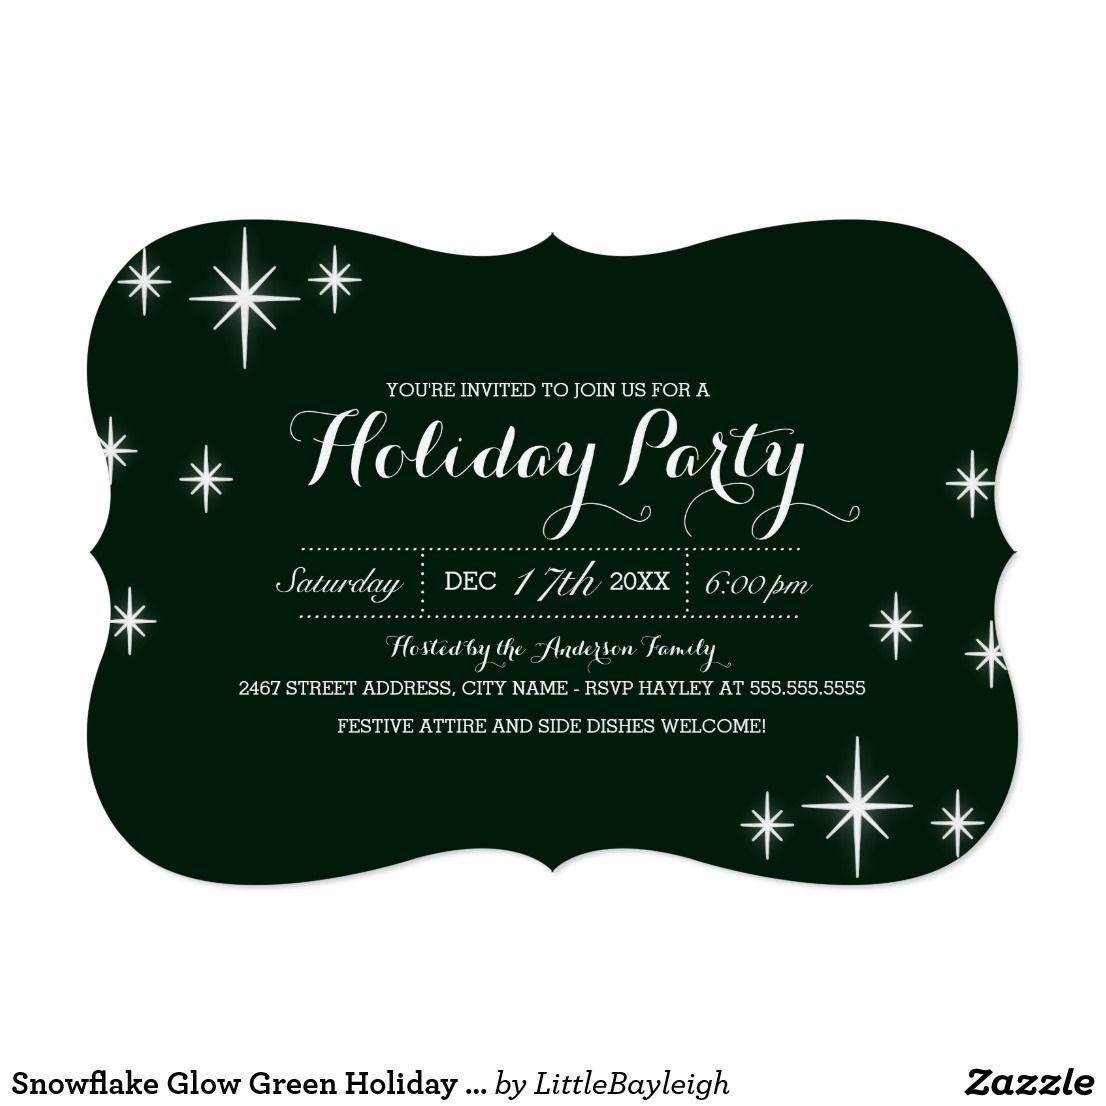 Snowflake Glow Green Holiday Party Invitation More Modern Christmas Party Invitati Holiday Party Invitations Modern Christmas Party Christmas Party Invitations